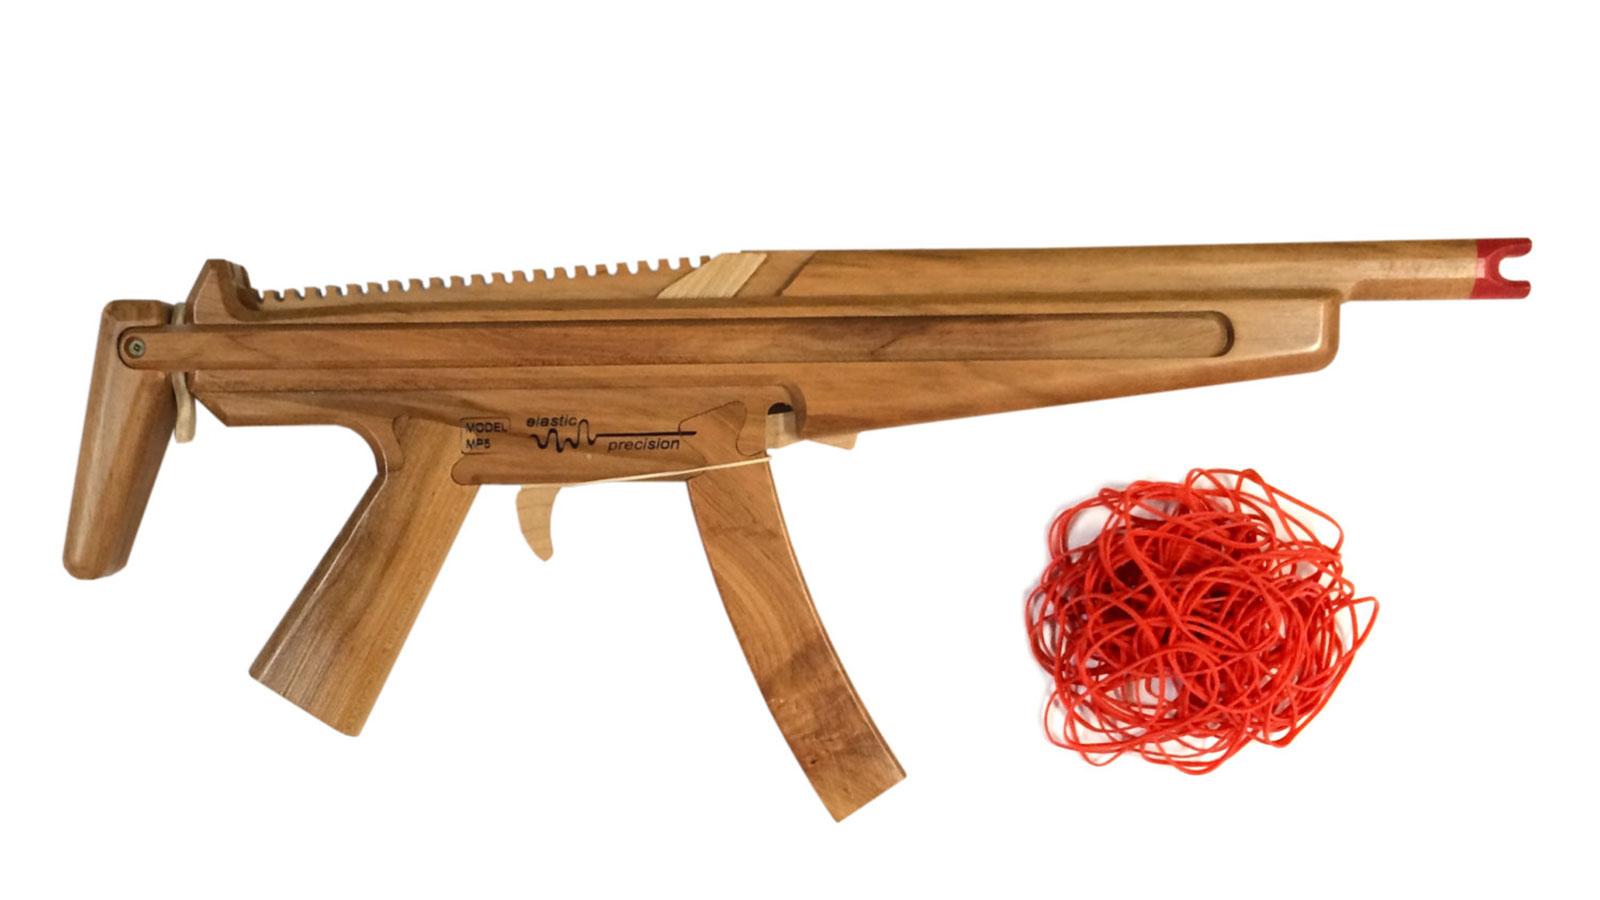 ELASTICPRECISION RUBBER BAND SUB-MACHINE GUN